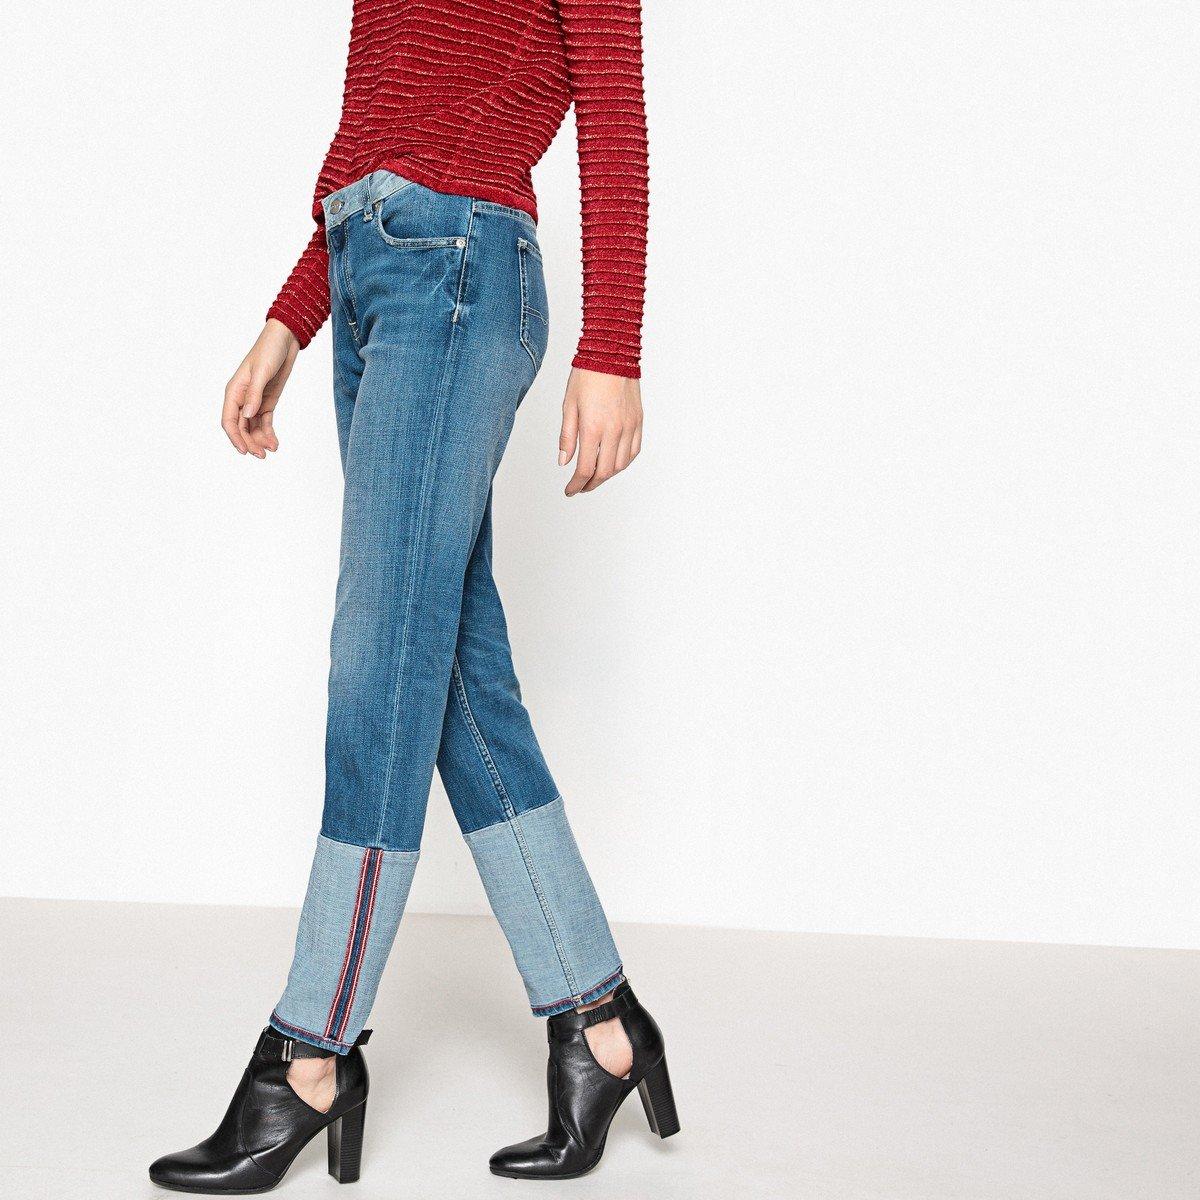 Pepe Jeans Womens Heidi Reverse Straight Jeans Blue Size 30 Length 32